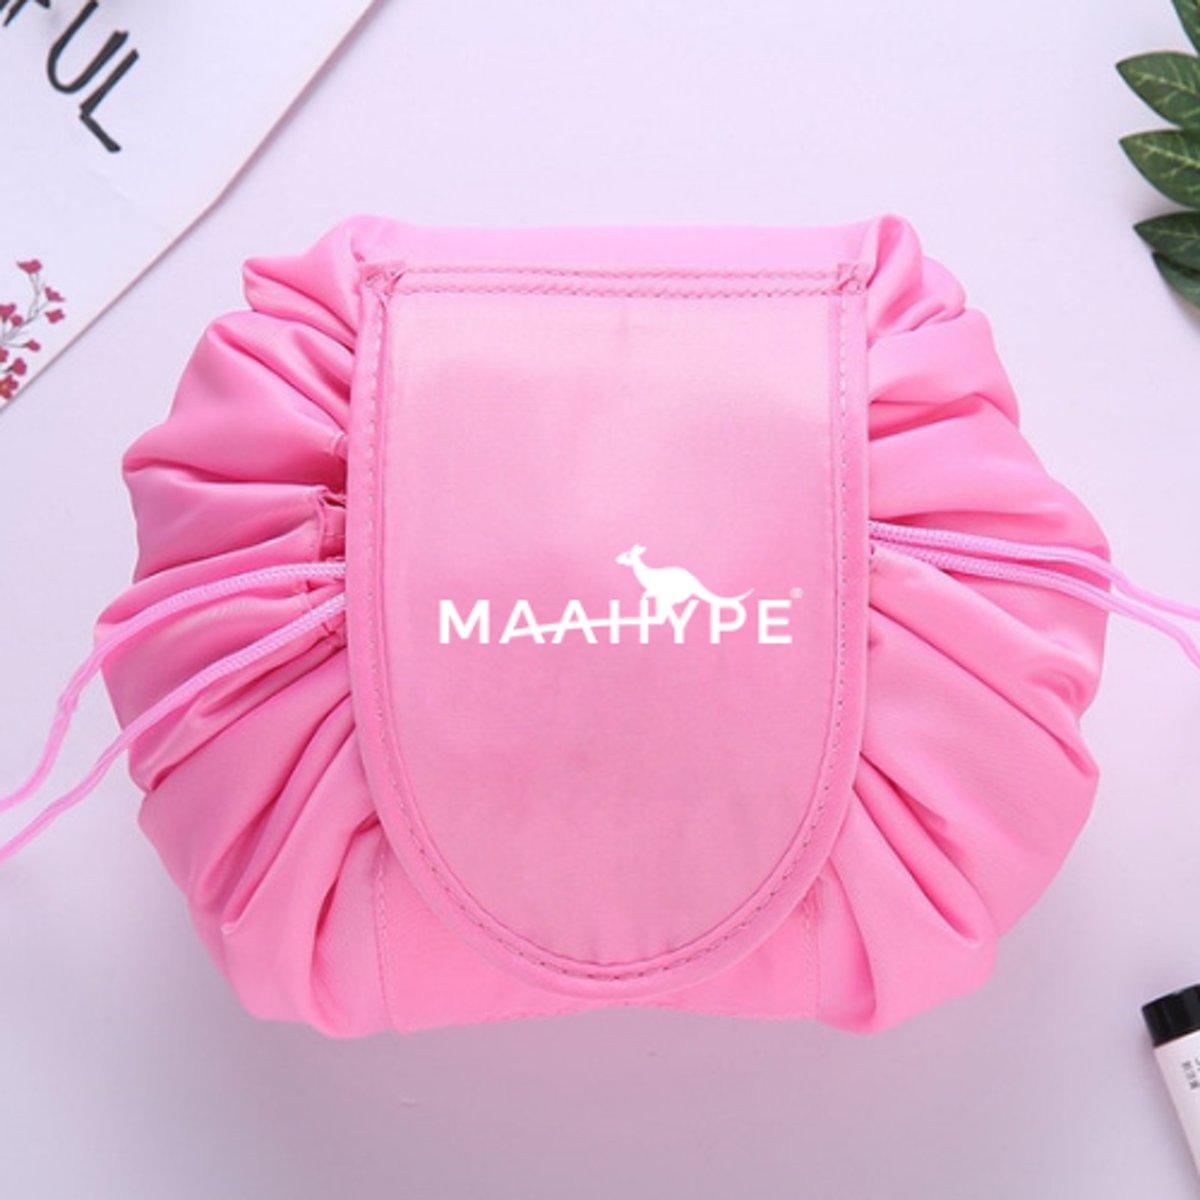 MaaHype Make-up organiser - Makeup opbergen - Accesoires organiser - Opbergsysteem - Reis toilettas - roze kopen